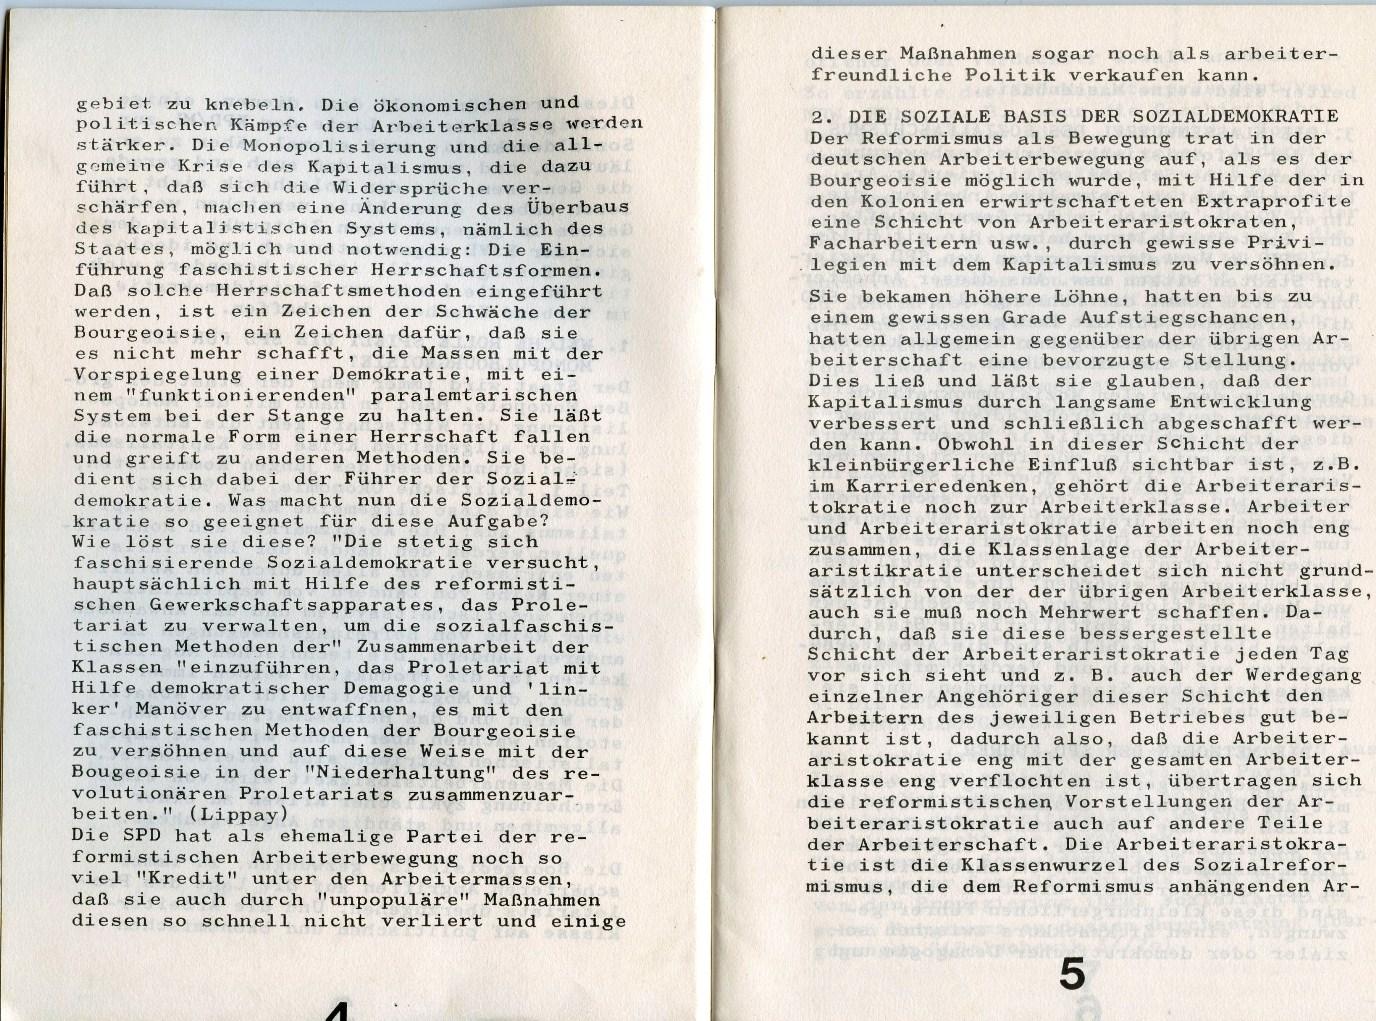 KJVD_Sozialdemokratie_Sozialfaschismus_1971_04